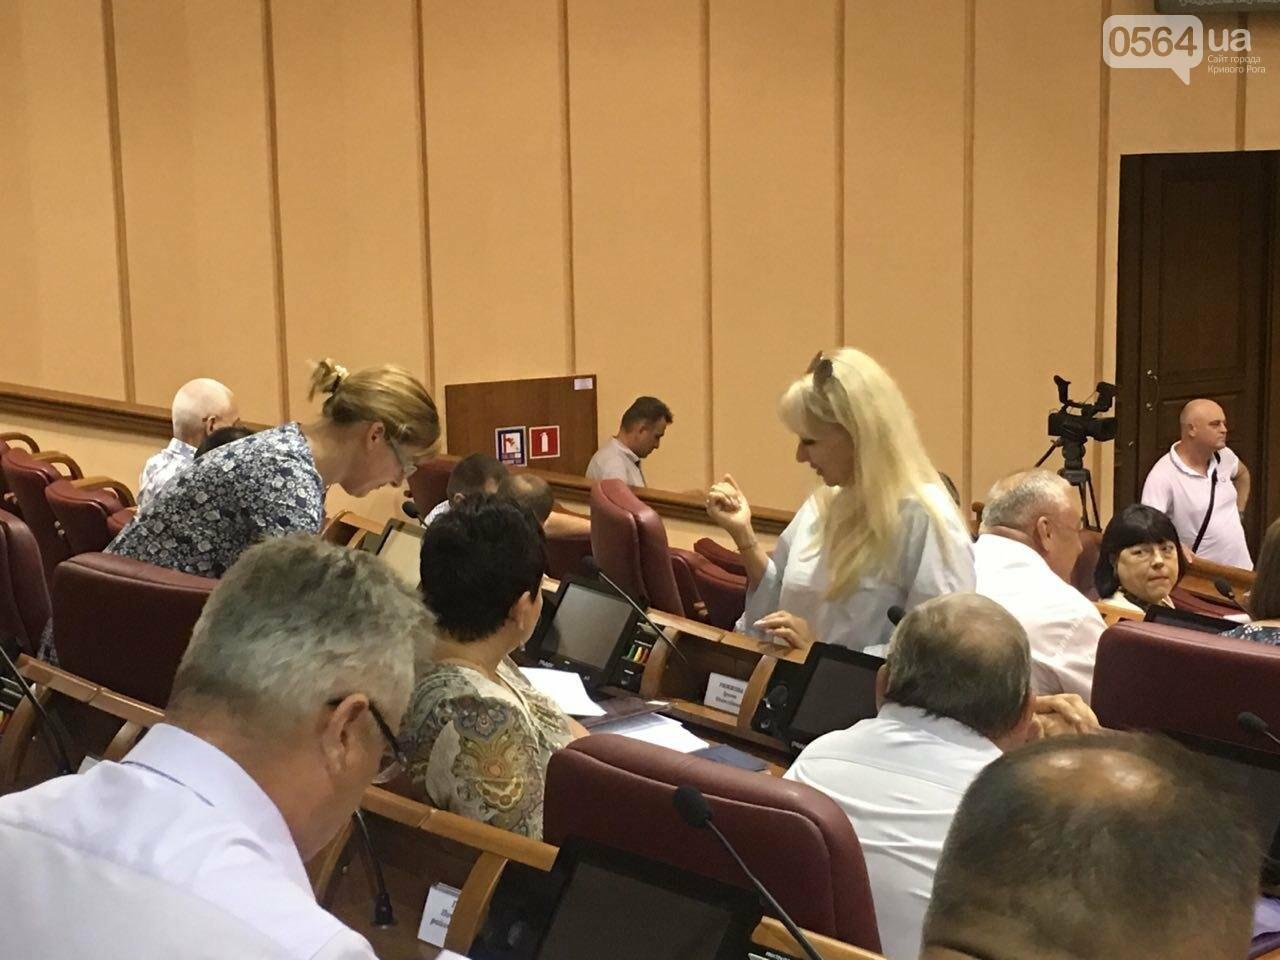 Криворожский горсовет не поддержал петицию о запрете Марша равенства, - ФОТО, фото-3